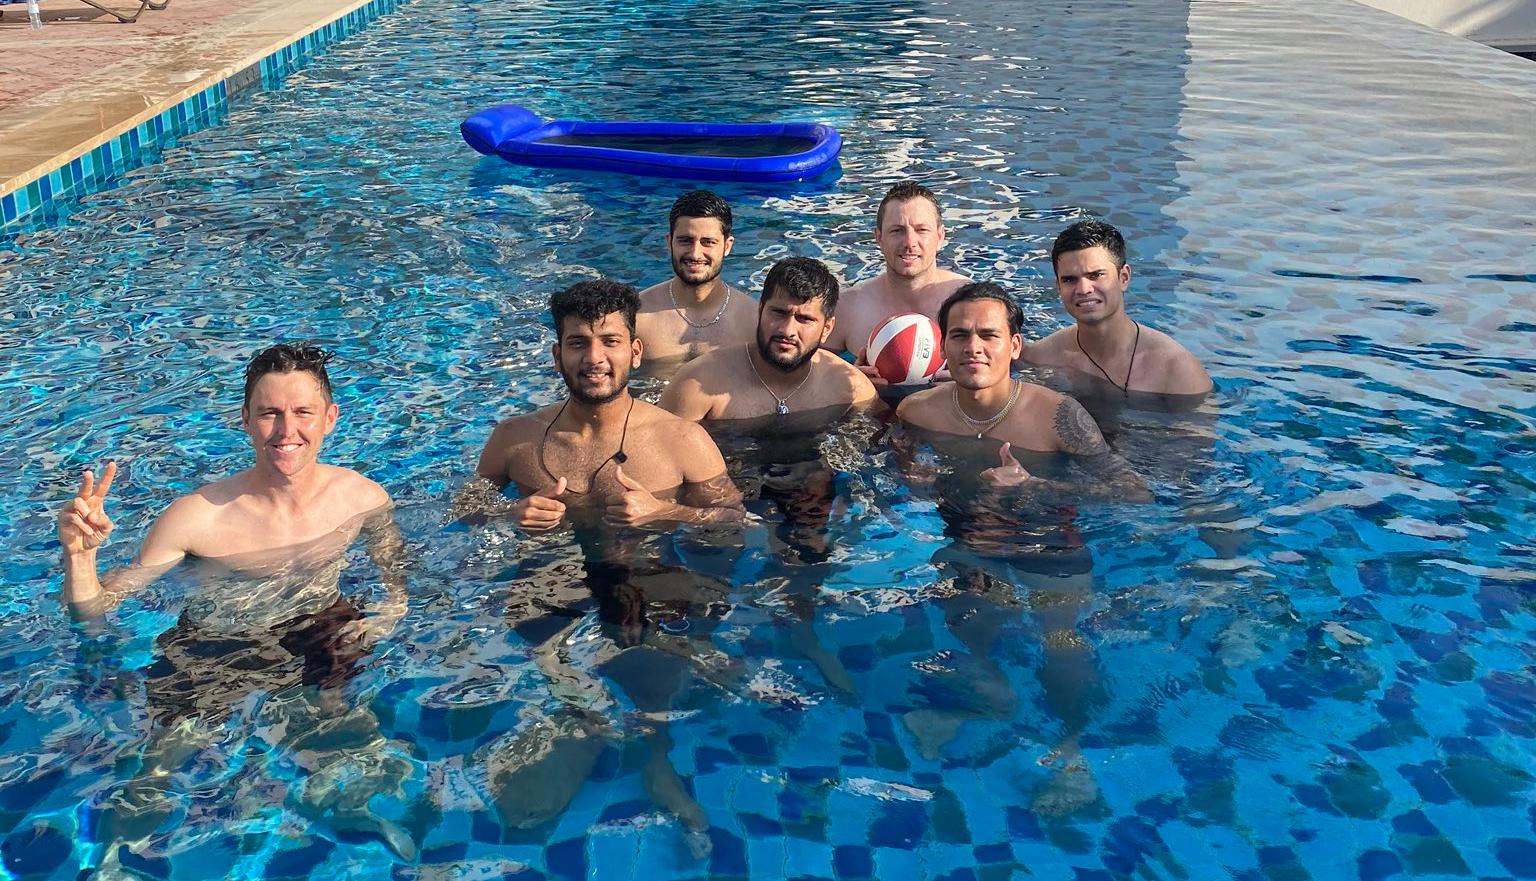 Arjun Tendulkar in the pool with MI players | Rahul Chahar Twitter